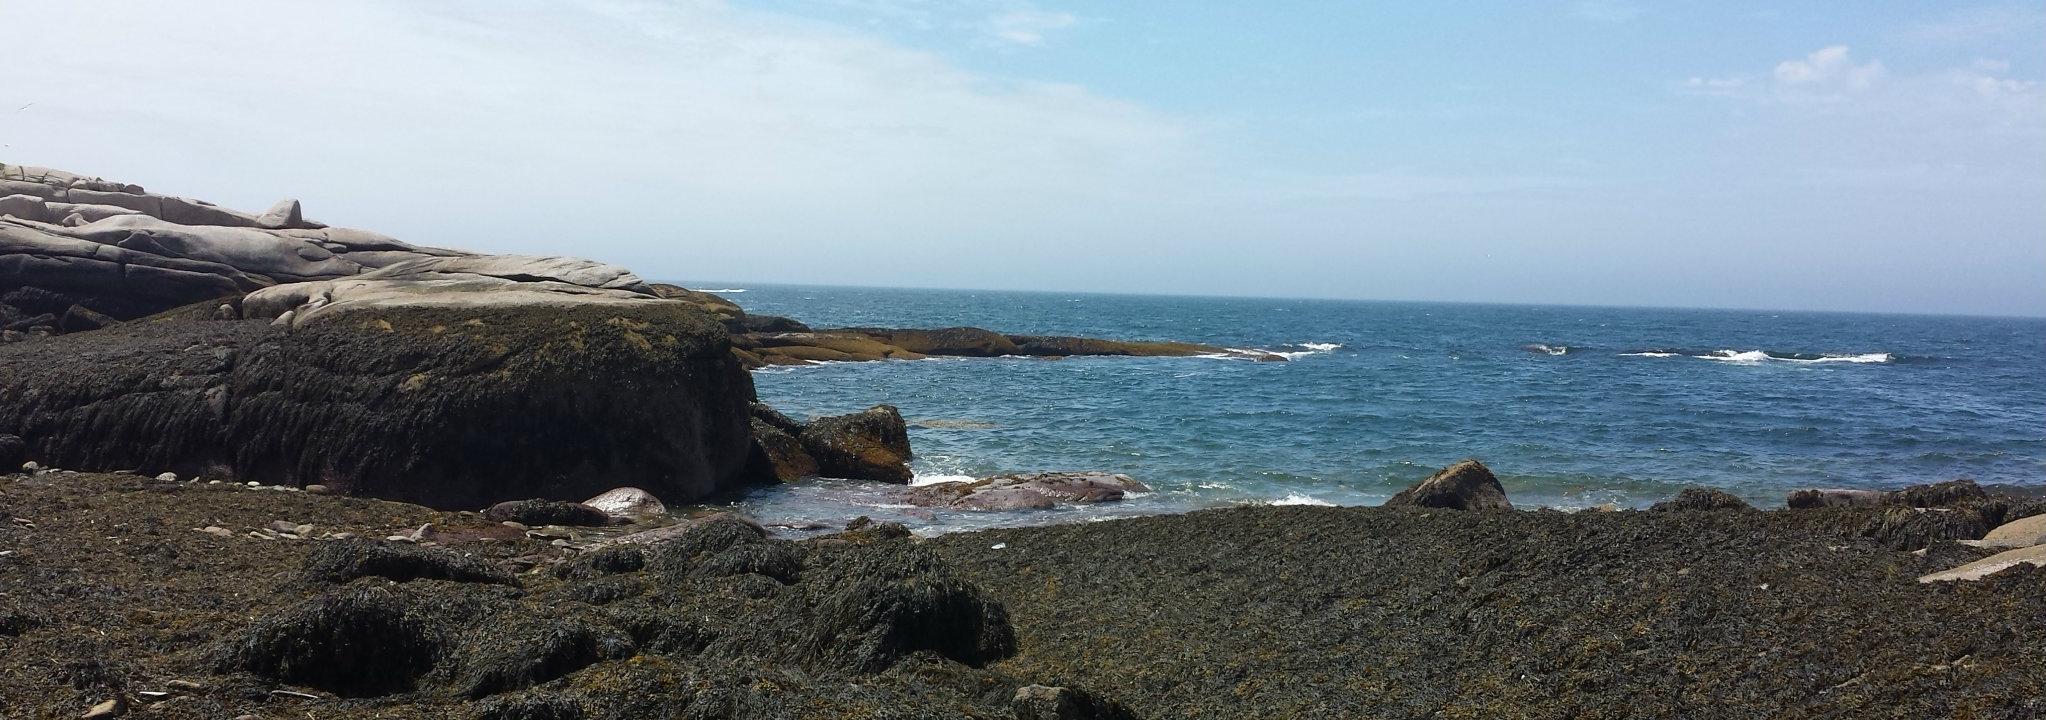 Exploring the intertidal near Two Bush Island!